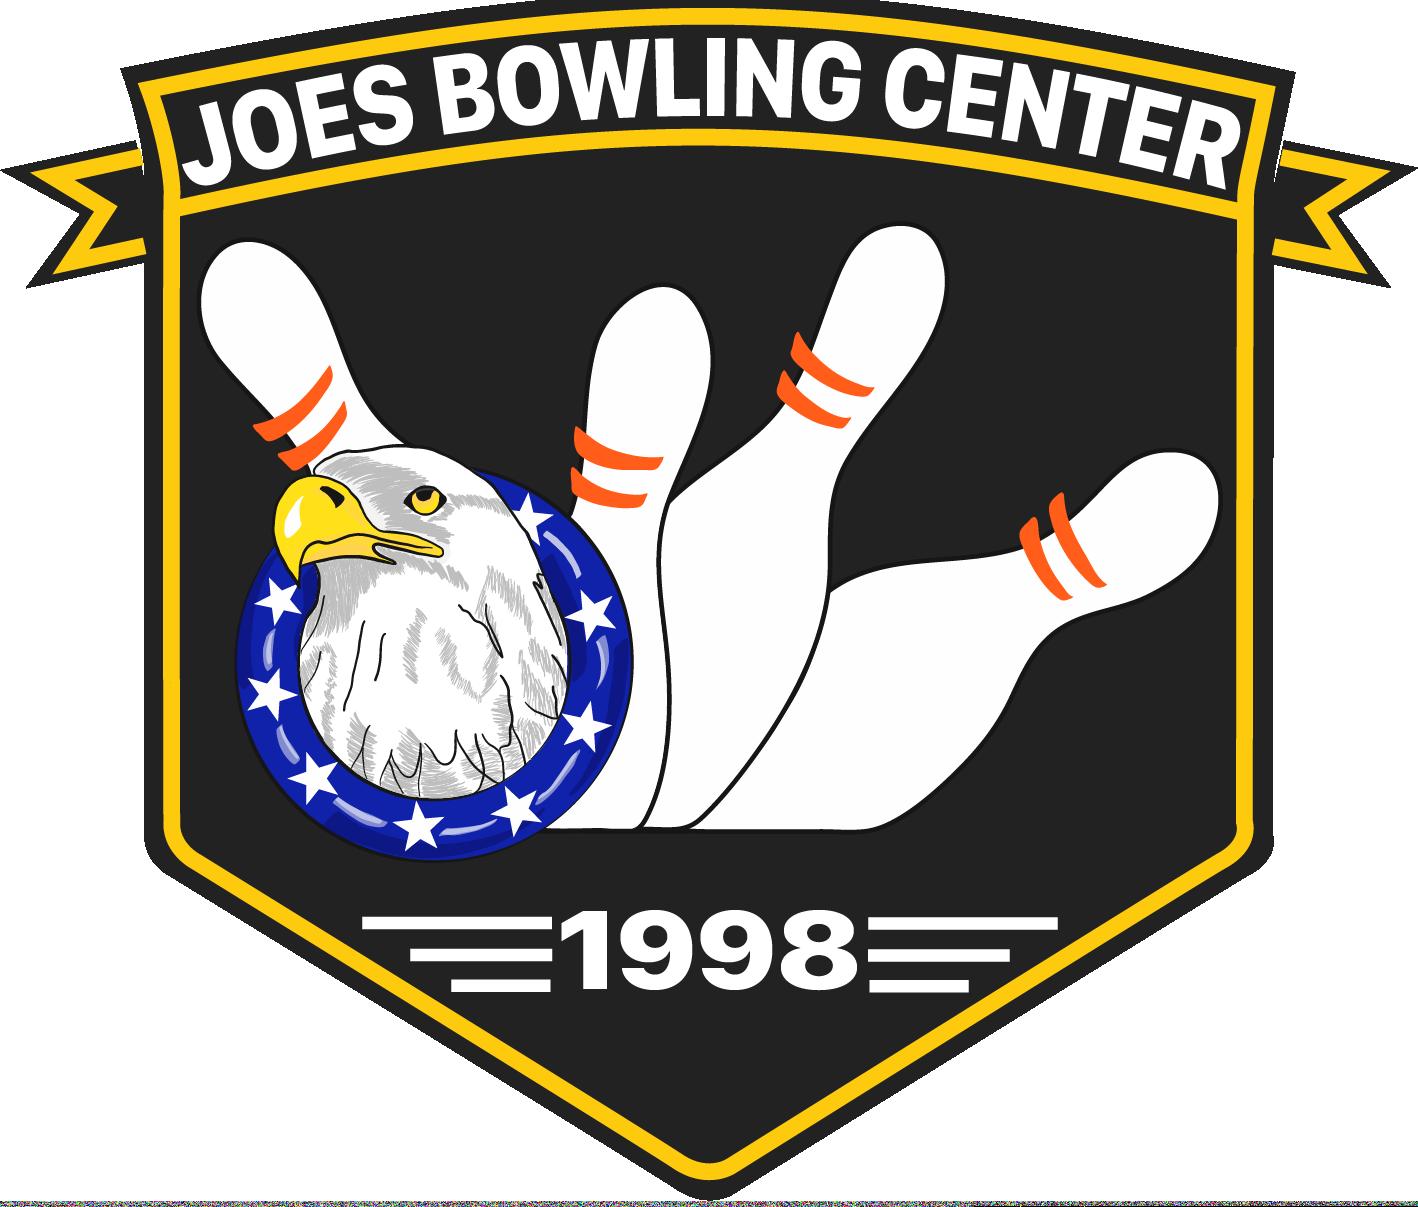 joesbowling